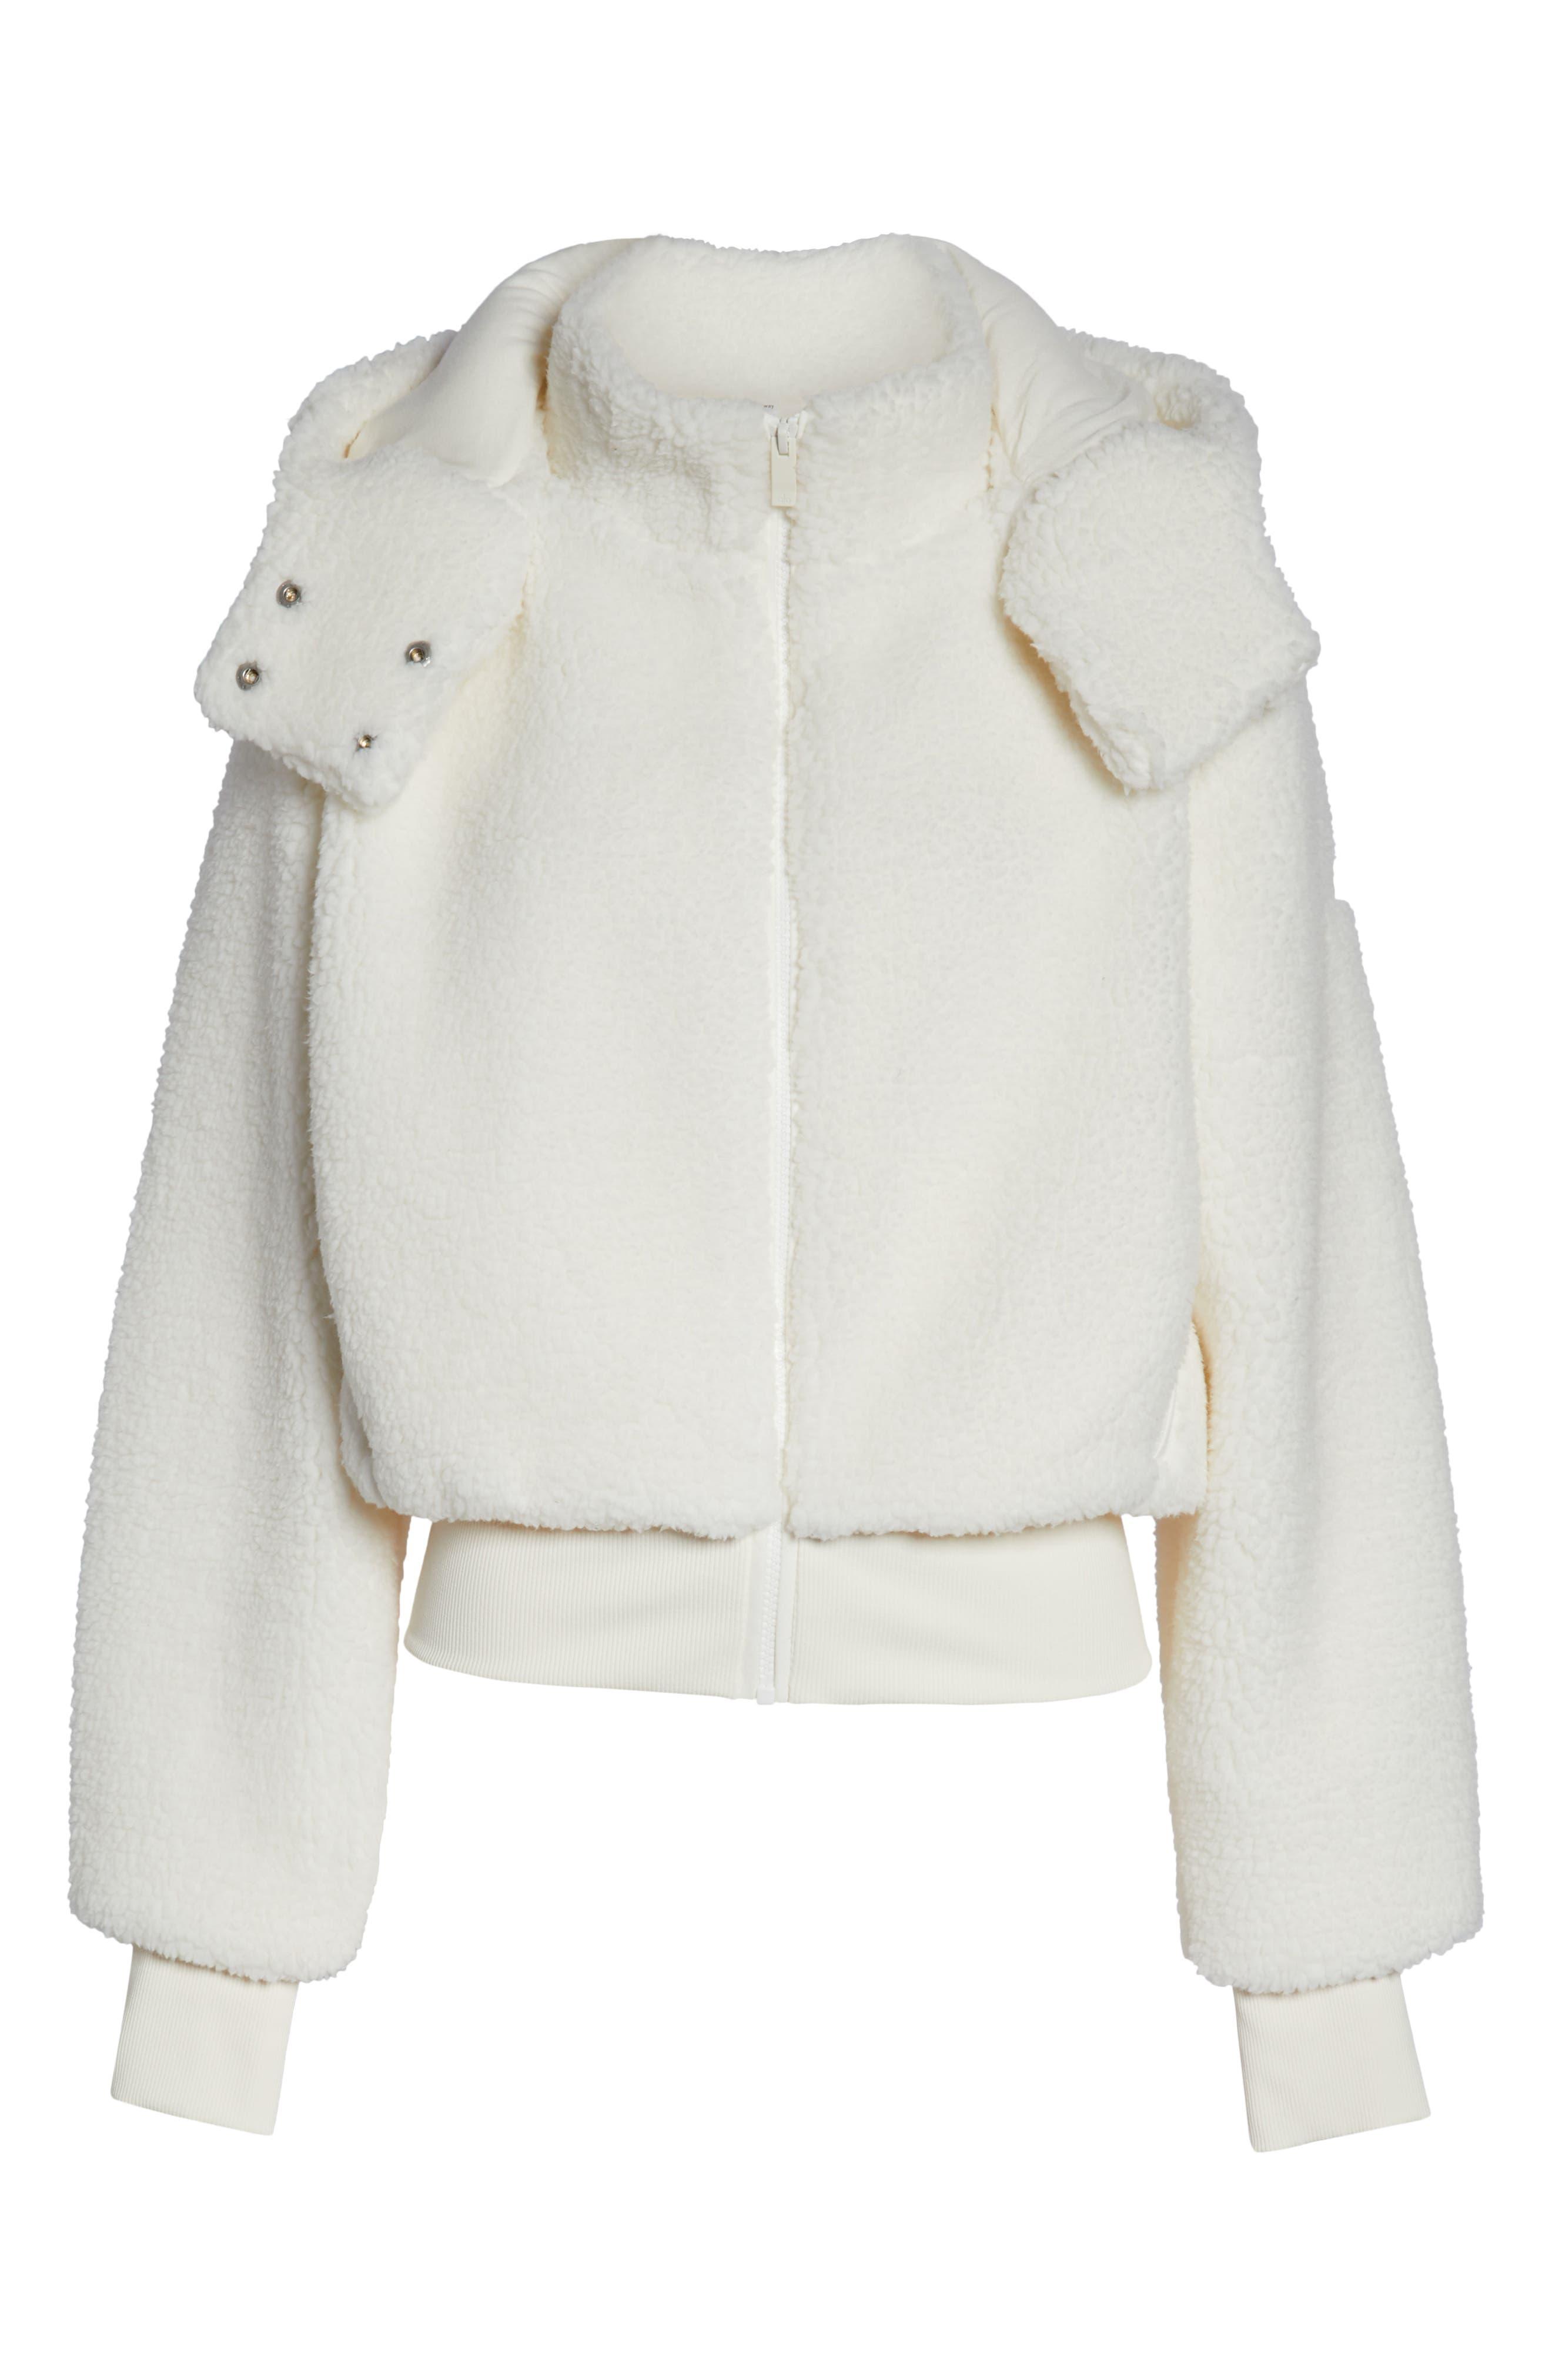 ALO, Foxy Faux Fur Jacket, Alternate thumbnail 7, color, PRISTINE